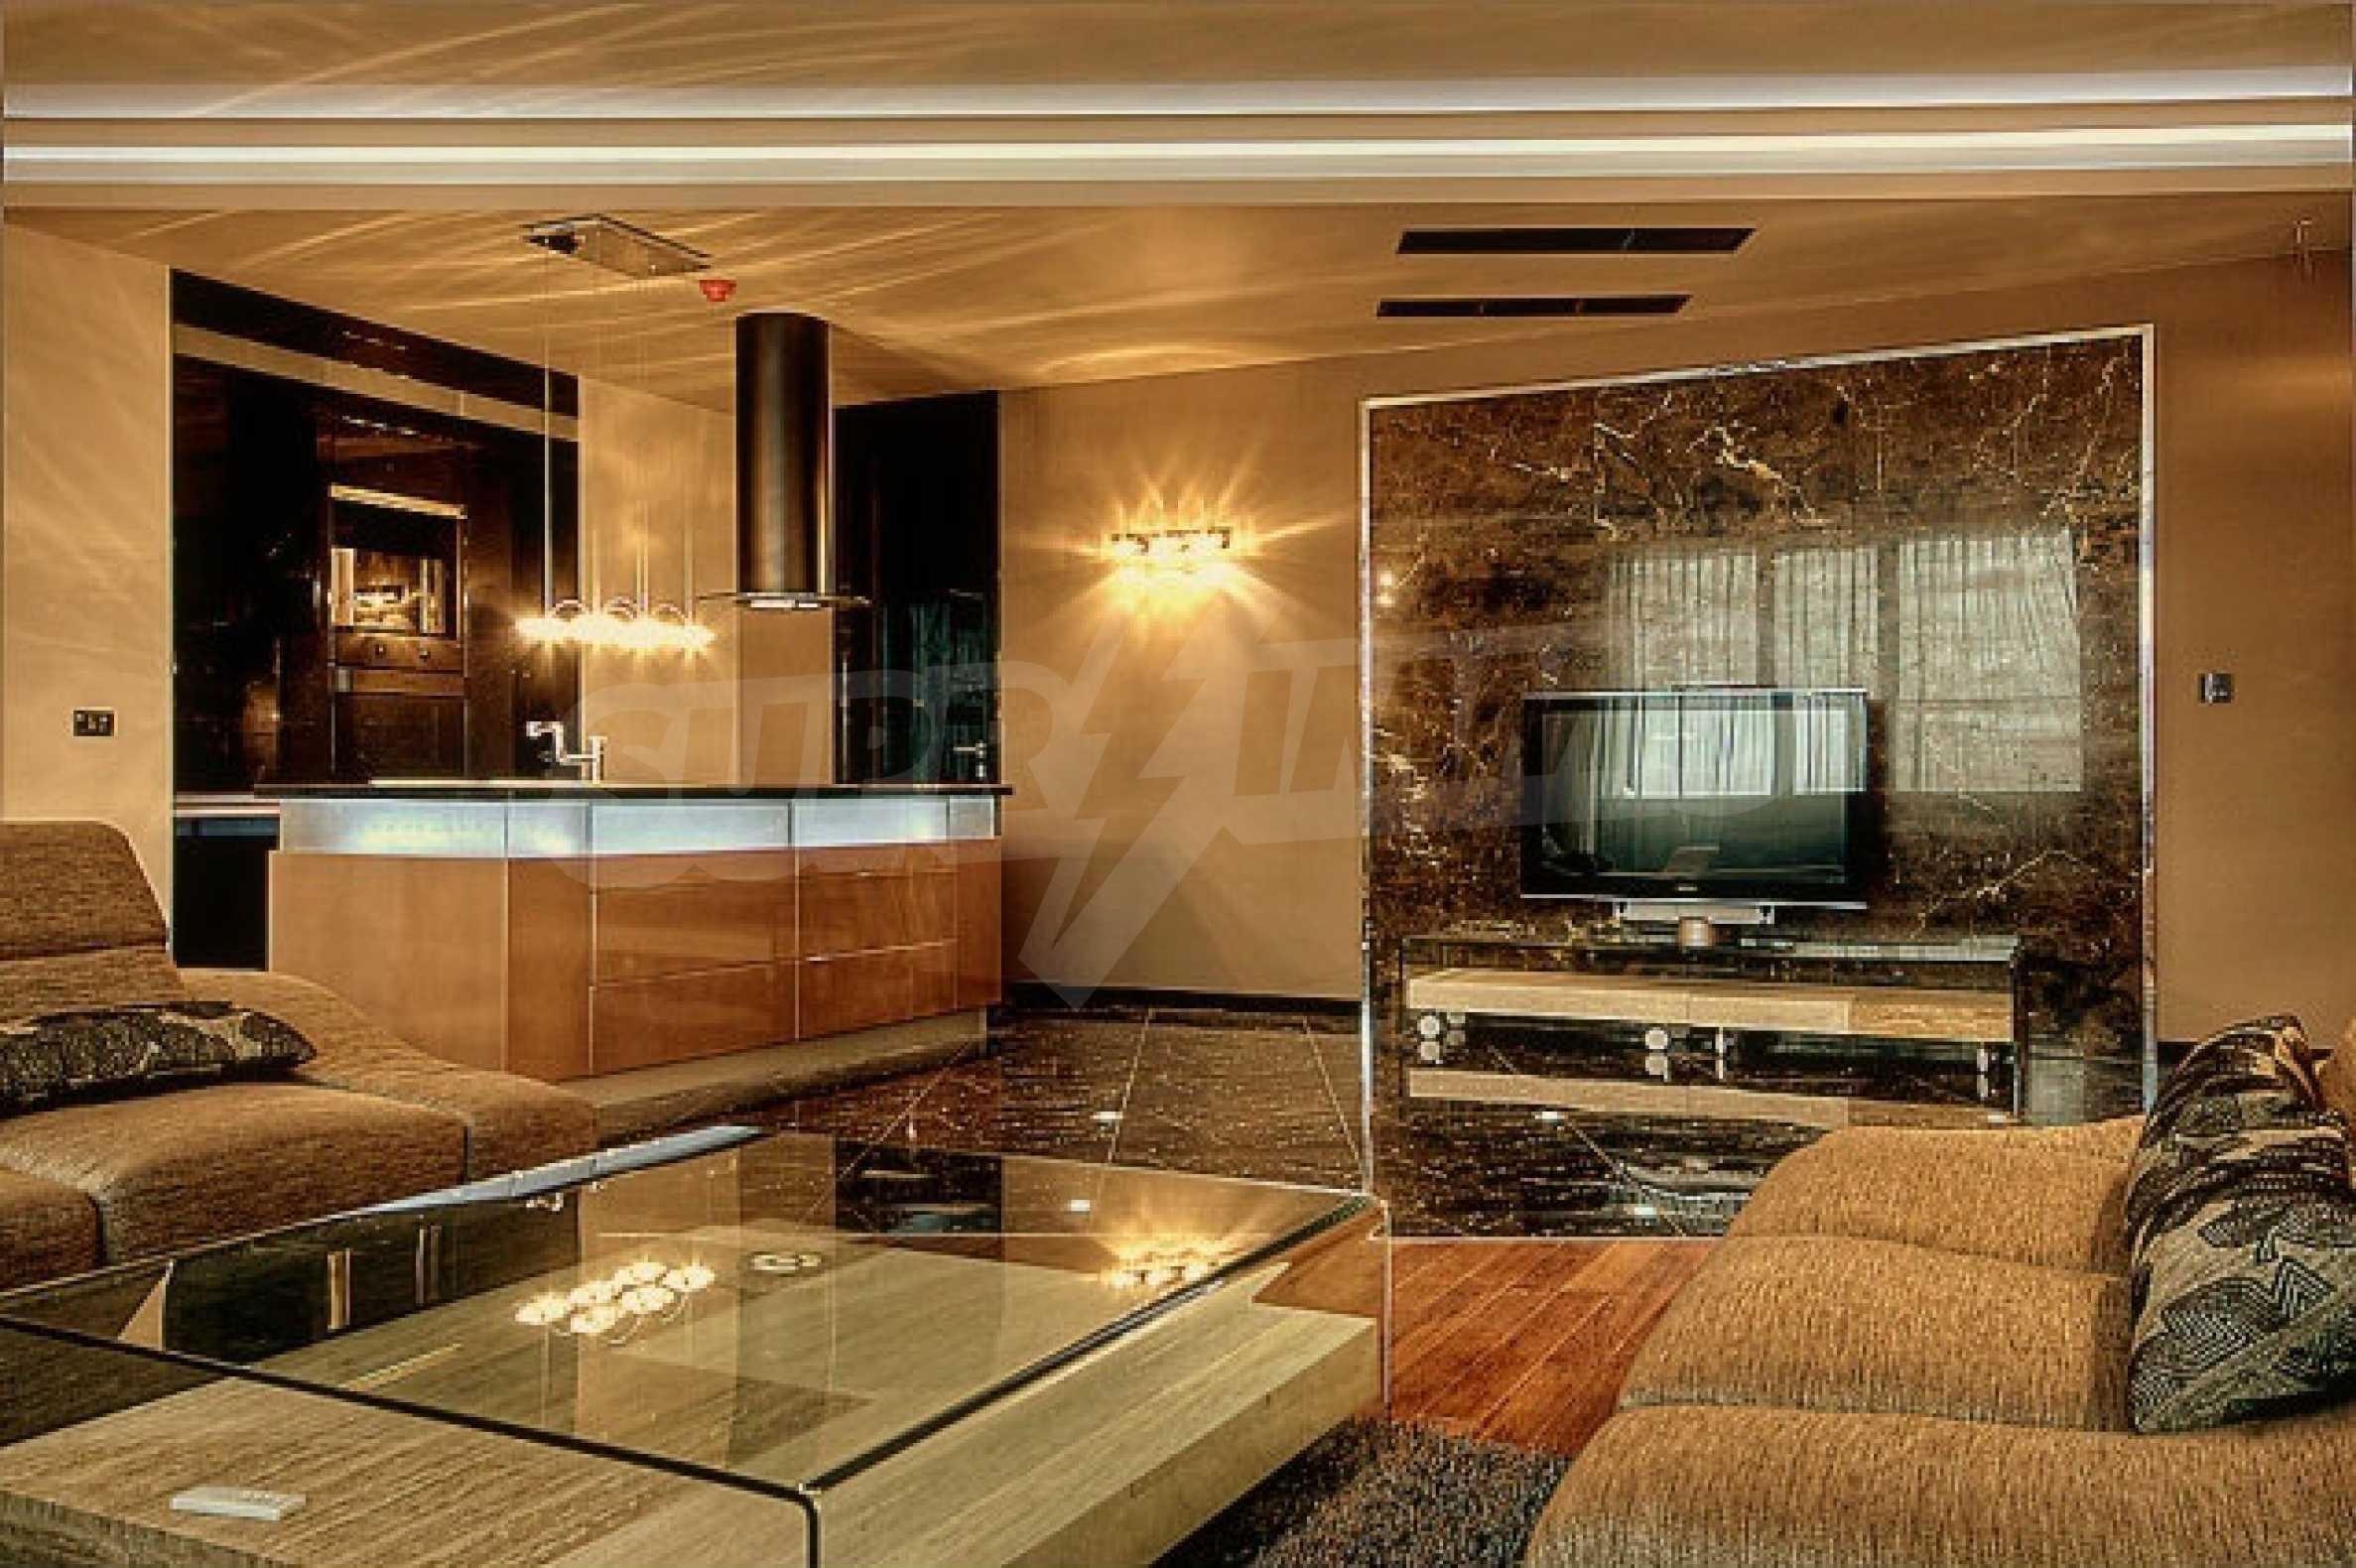 Abu Dhabi apartments 1